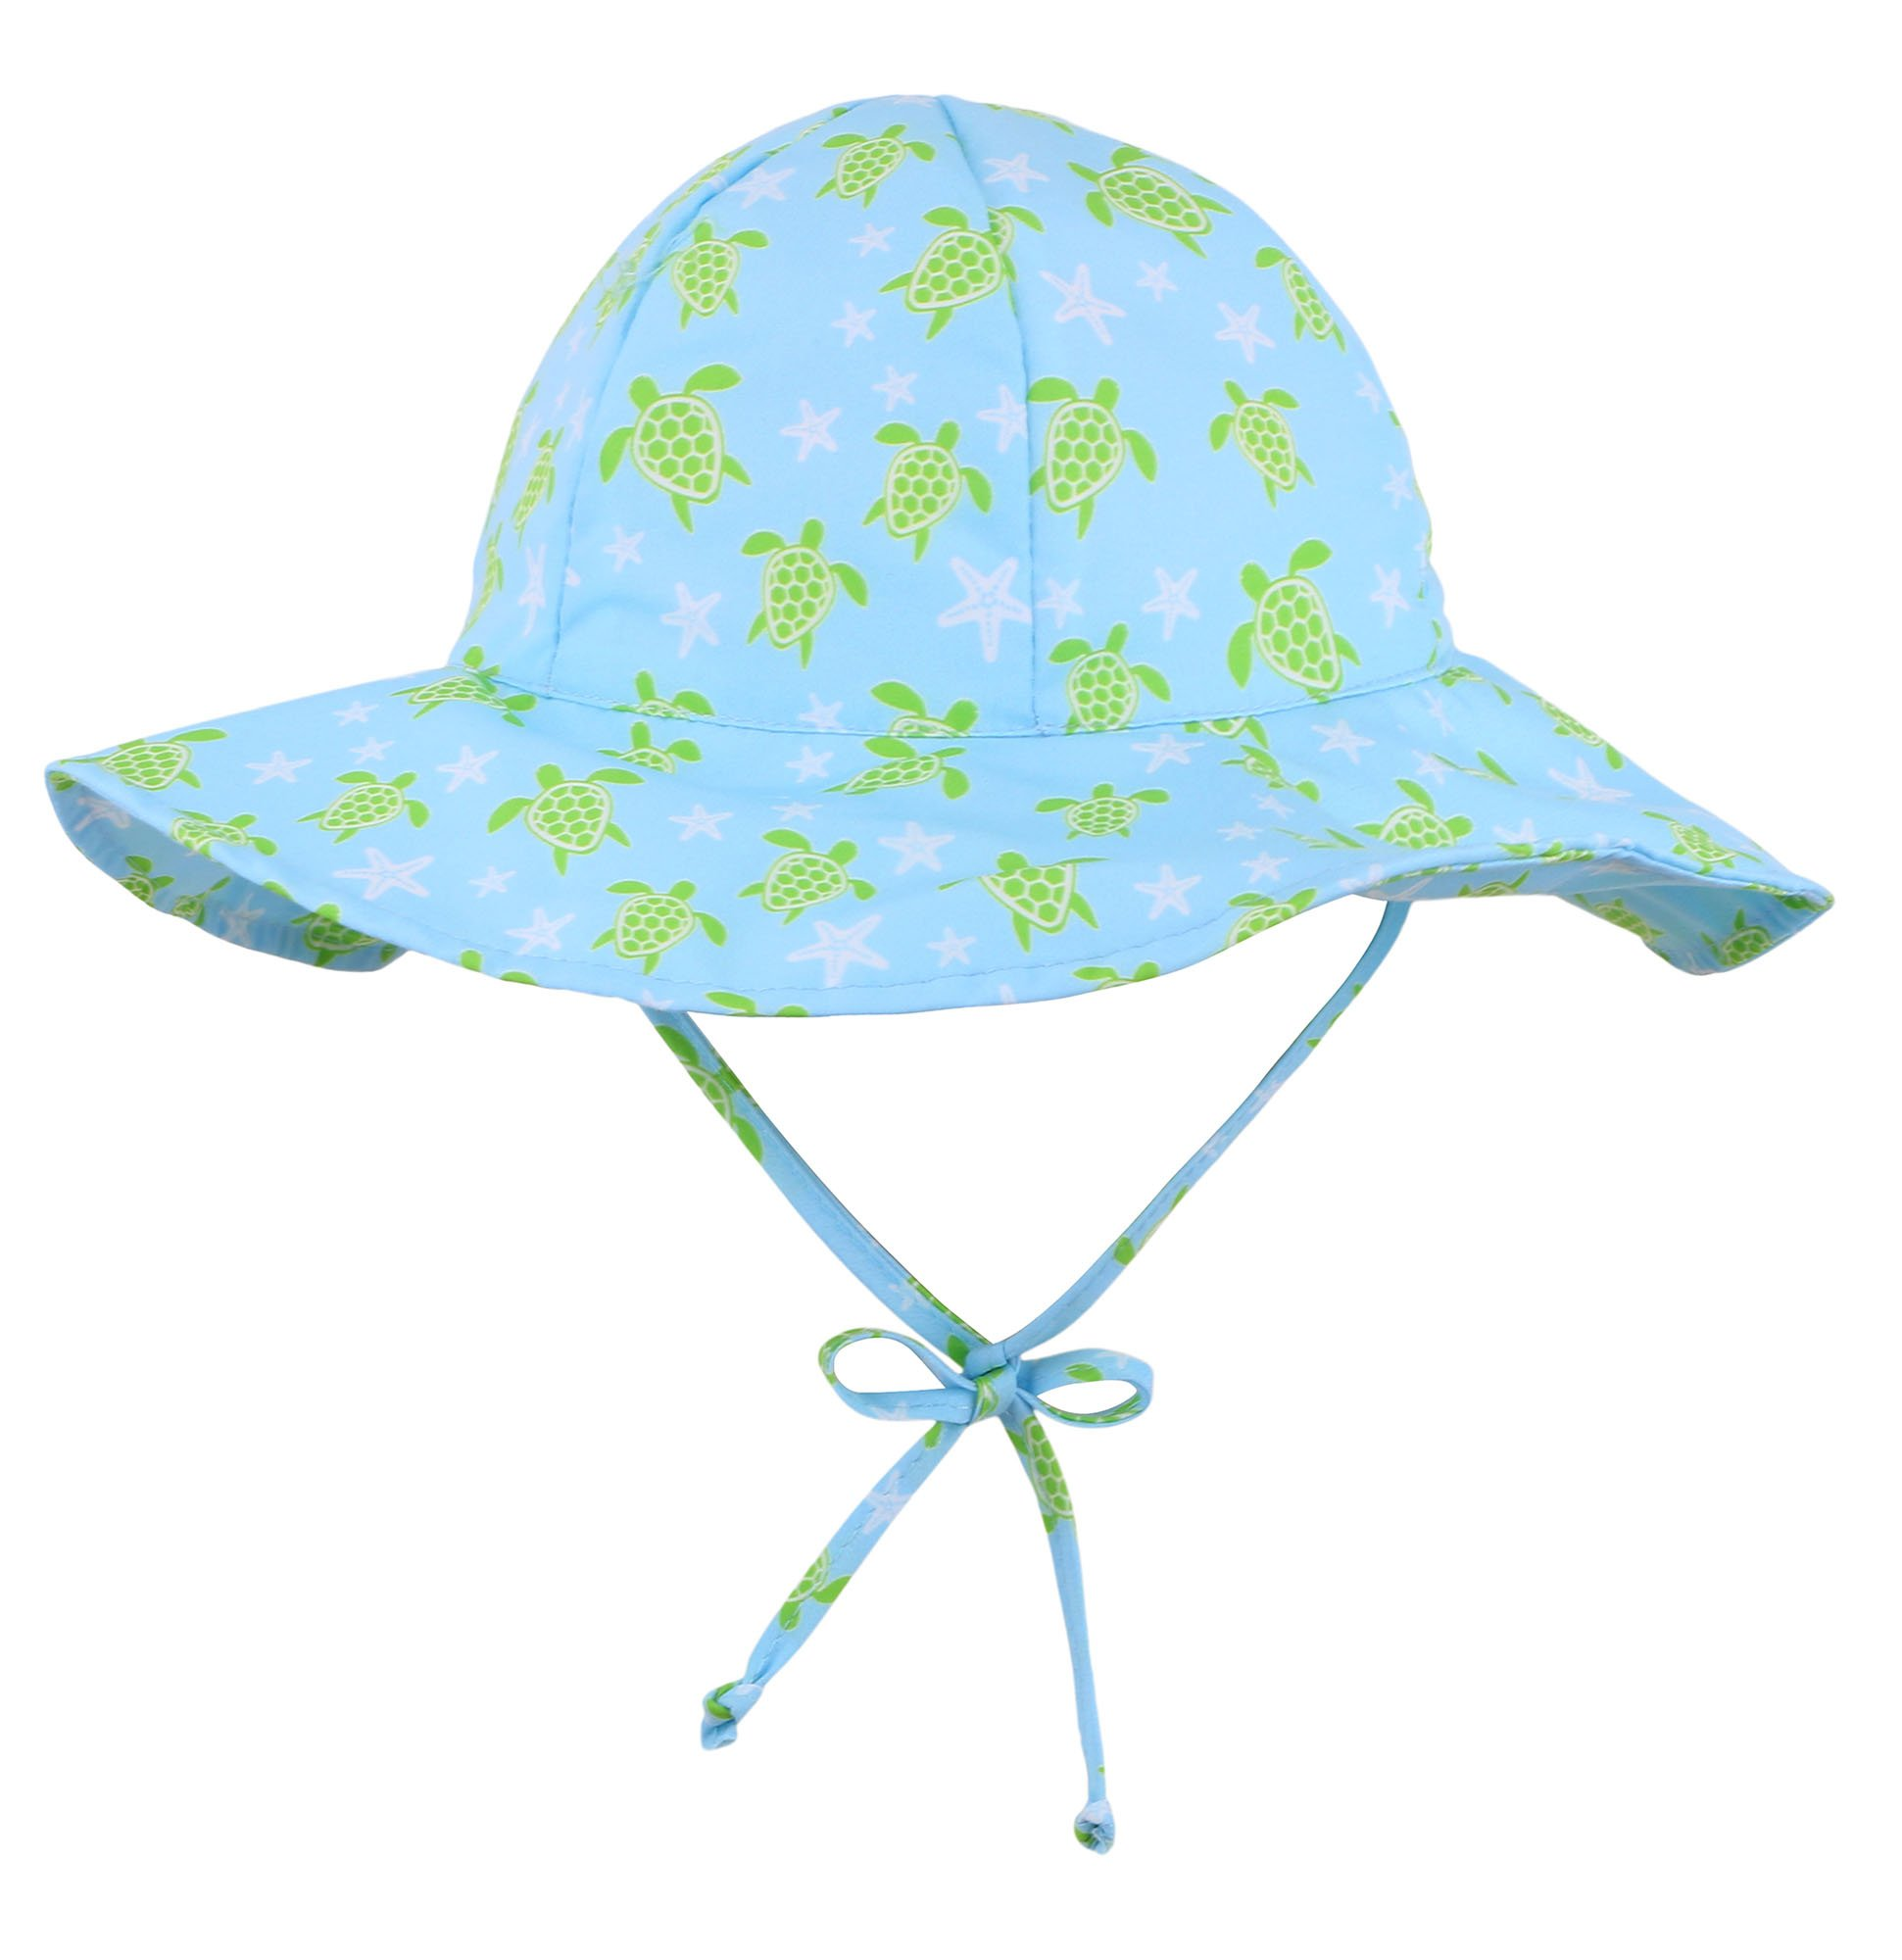 Livingston Children's Sun Protective Chin Strap Floppy Hat, Trutle, 0-12 Months